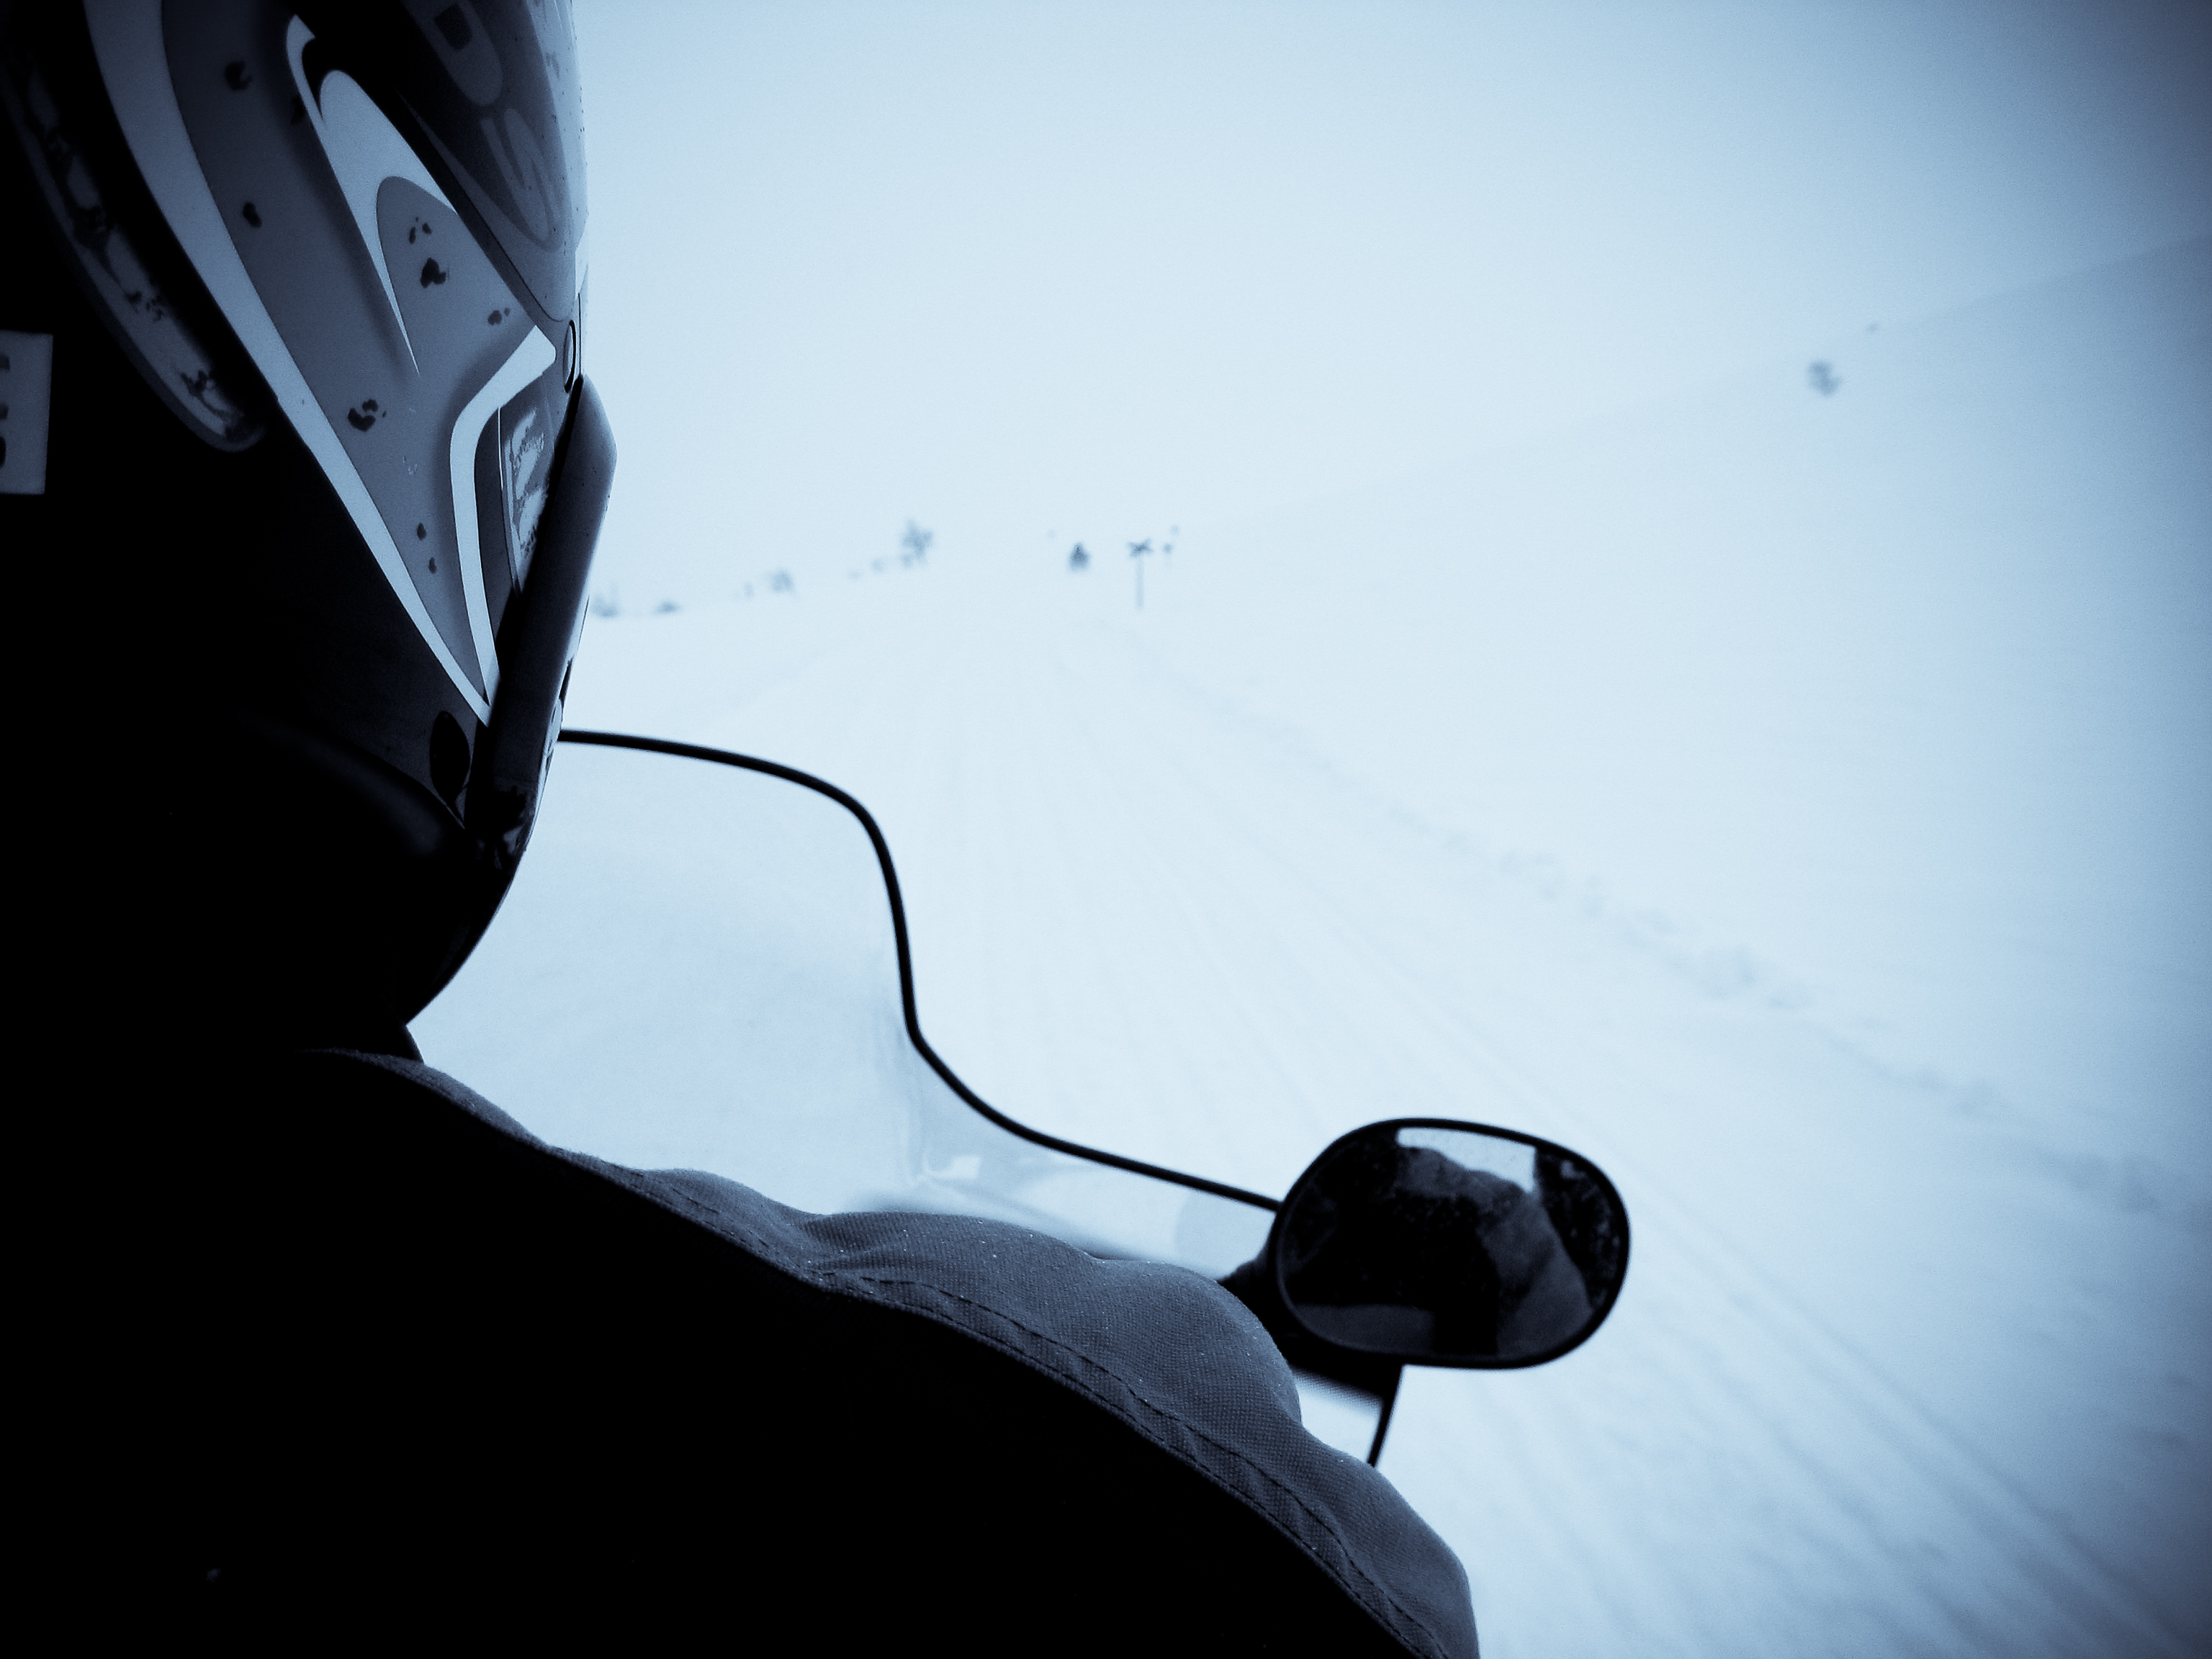 Snowmobiling. Credit: Jonas Bengtsson.